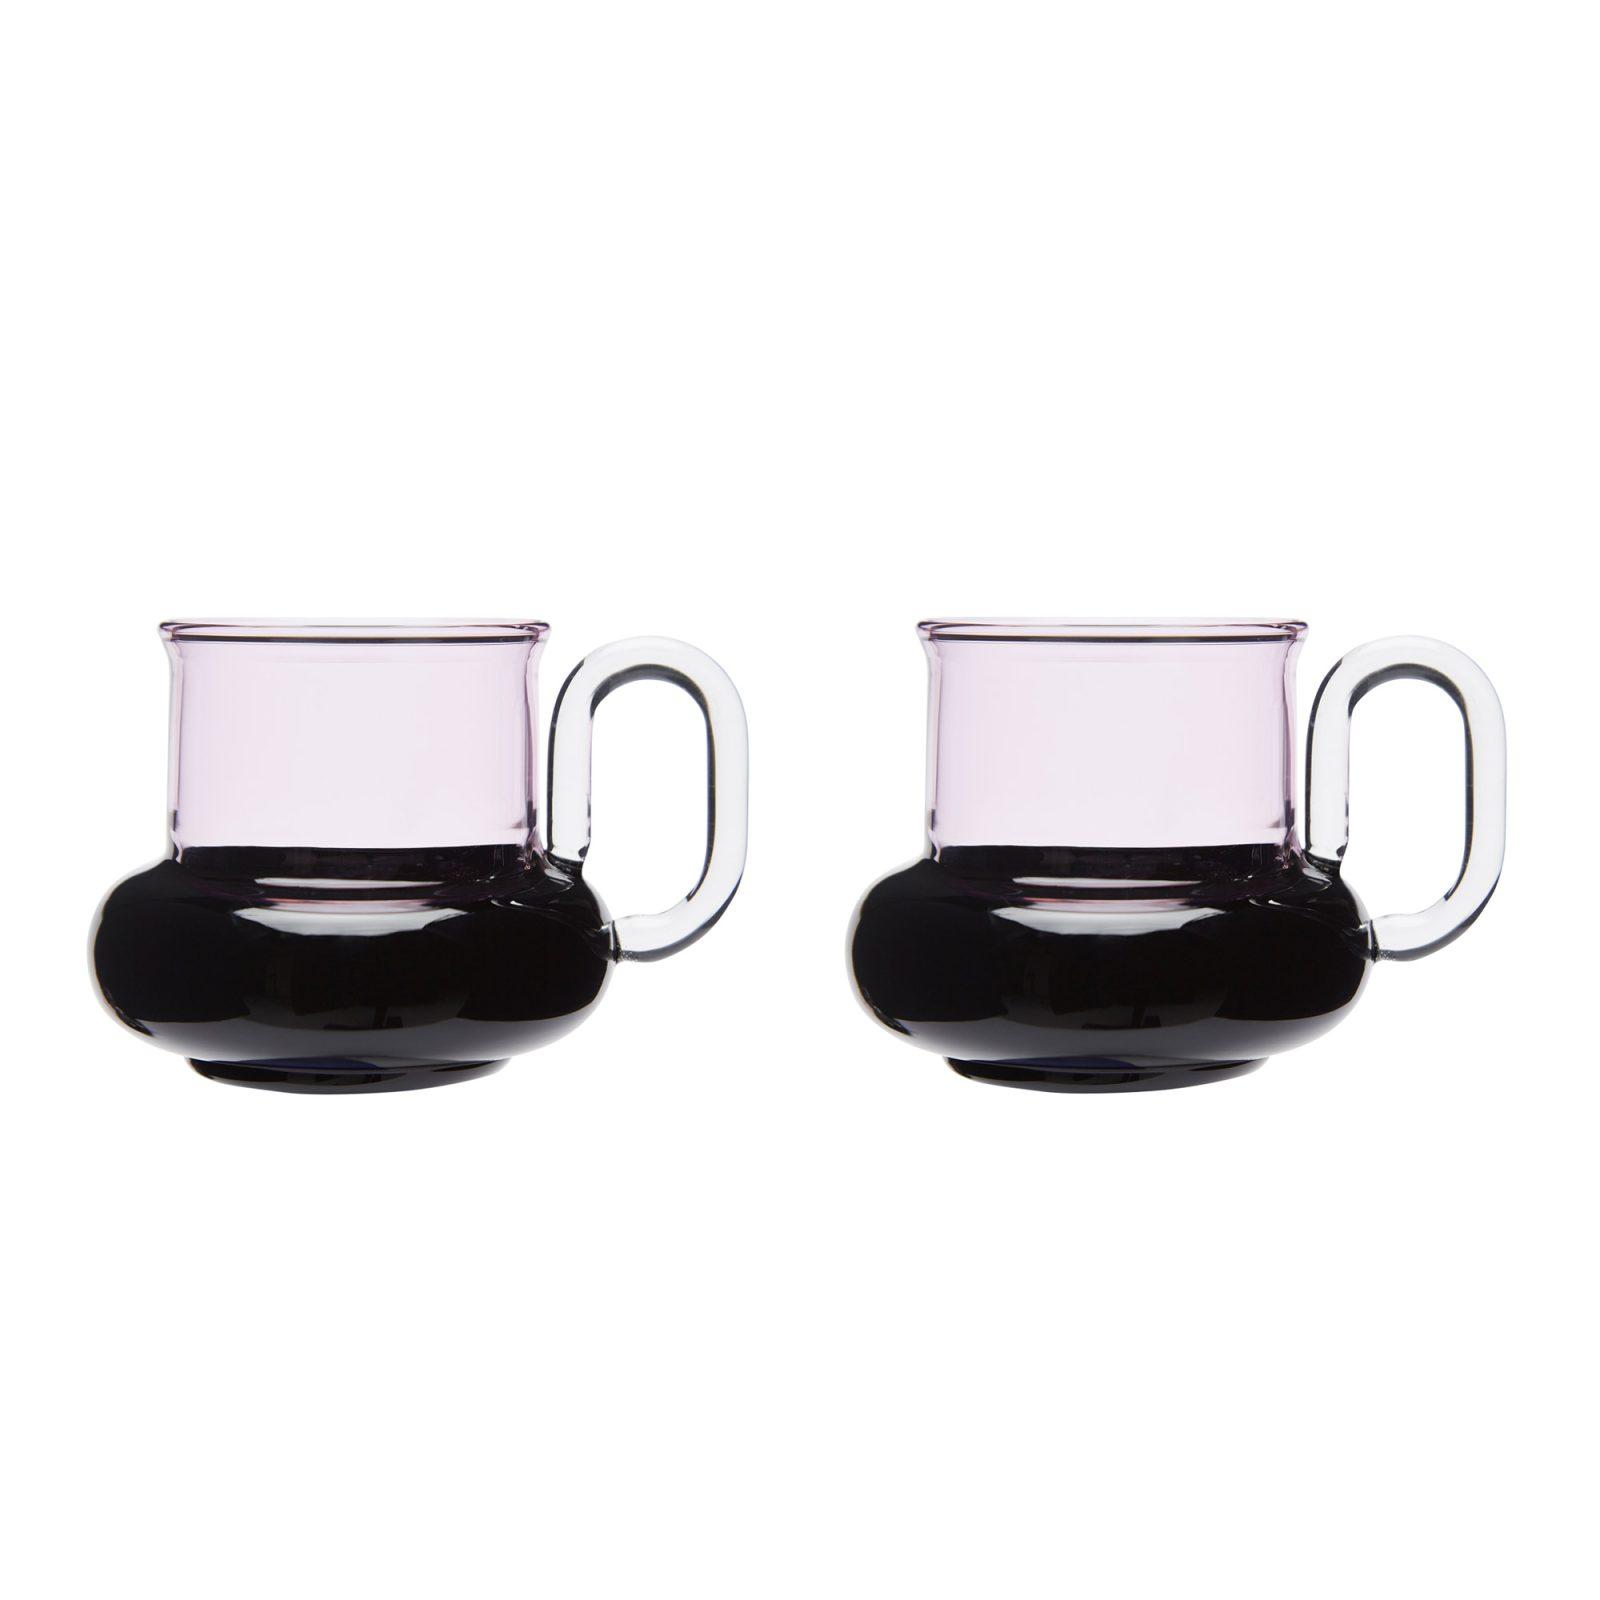 bump-tea-cup-set-5